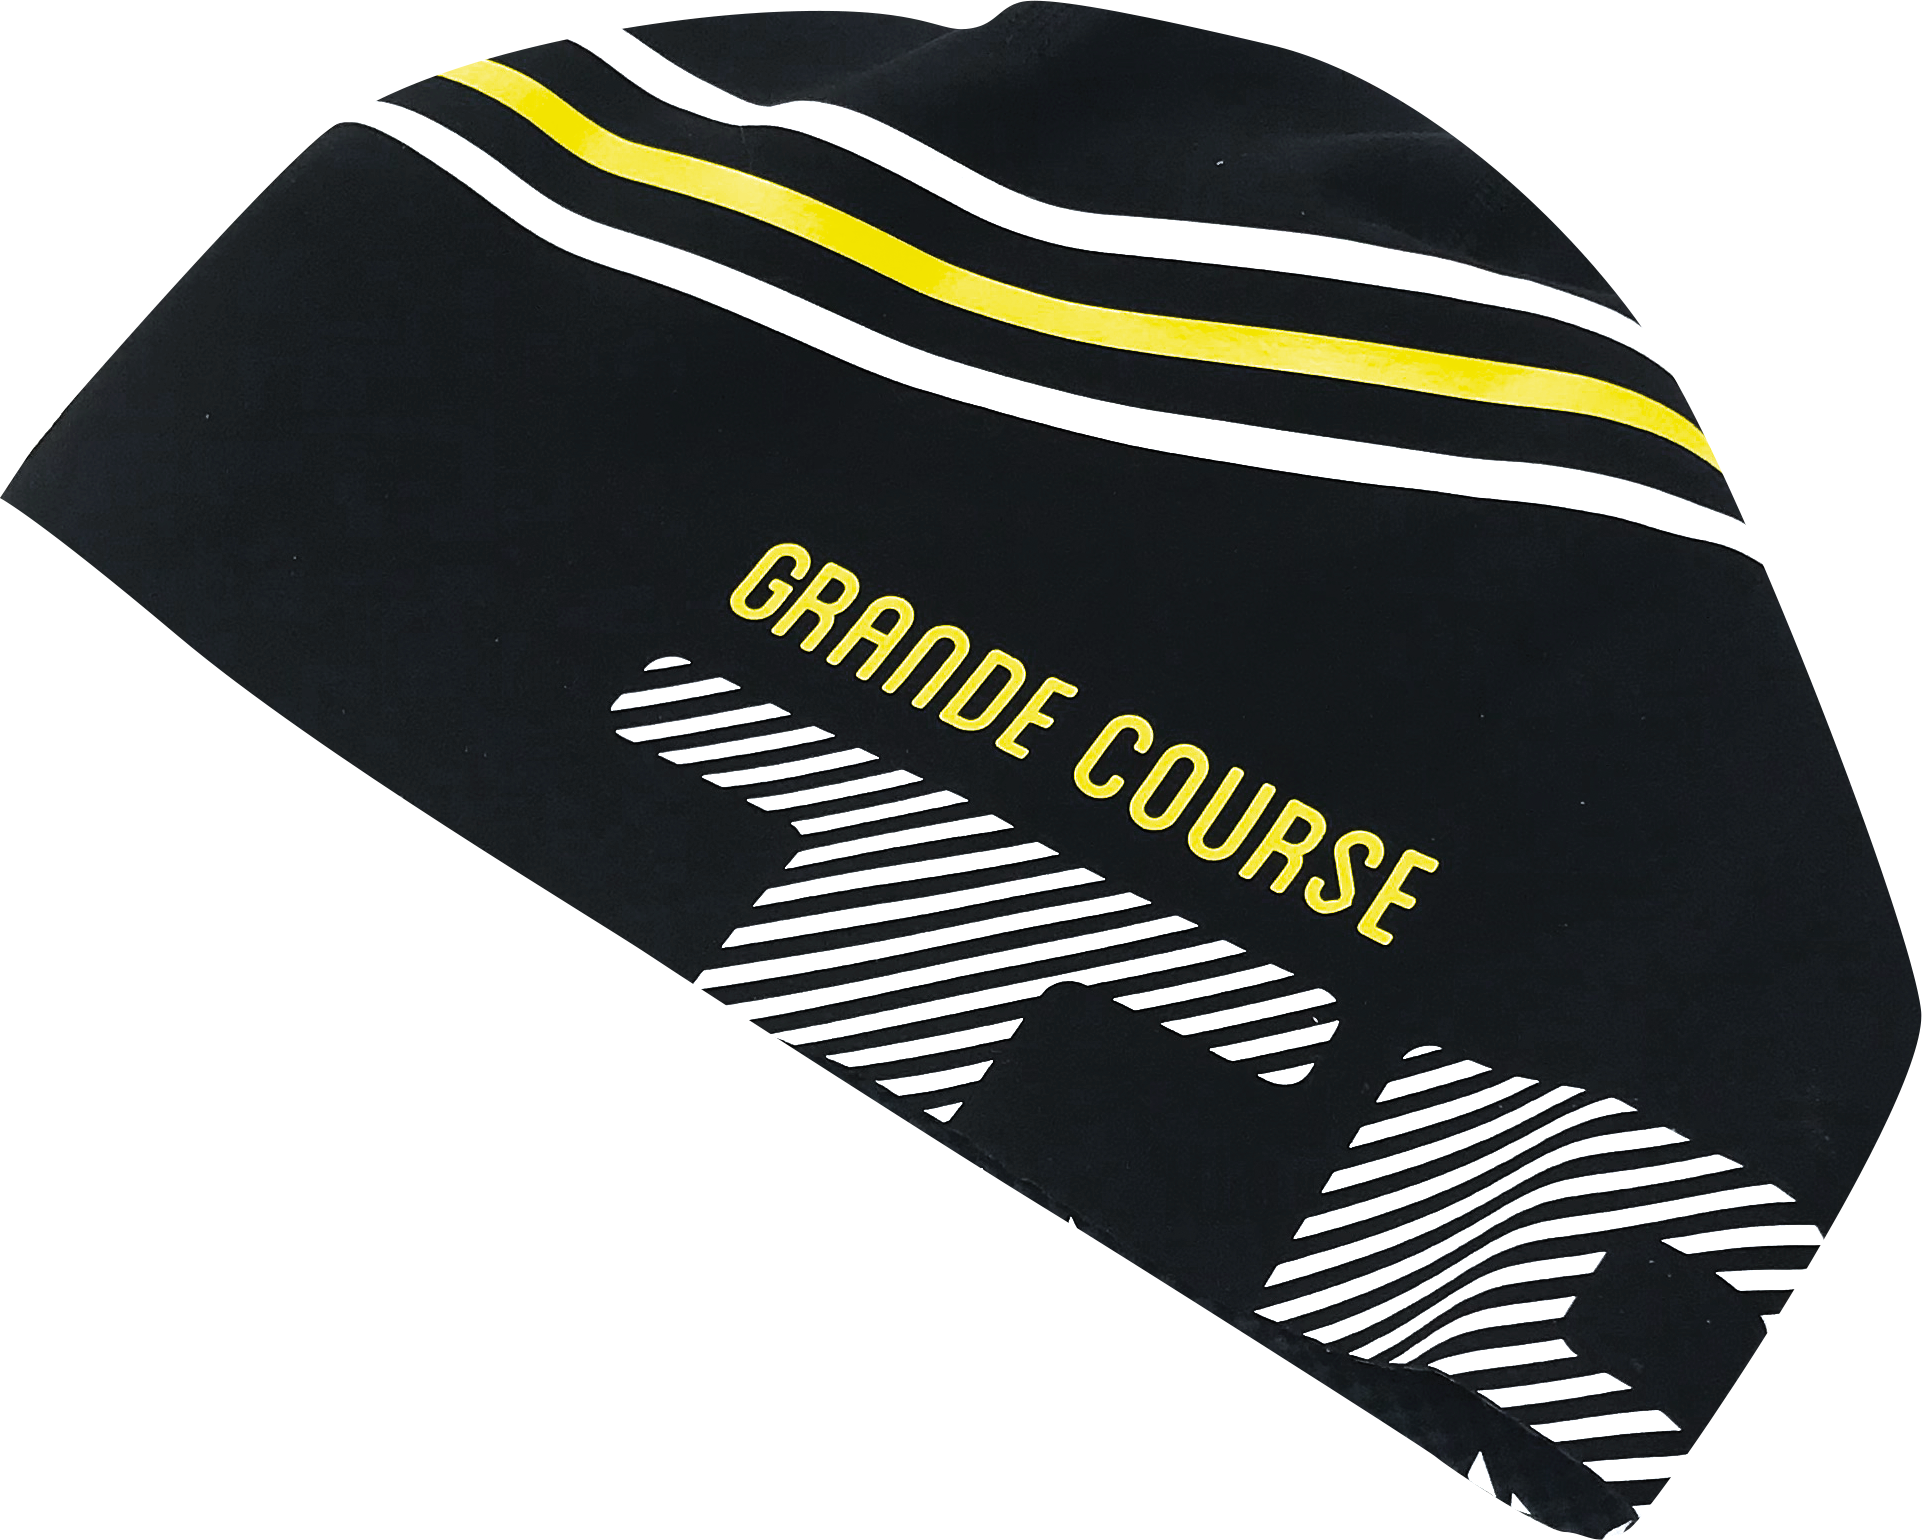 85134_grande-course_2.0